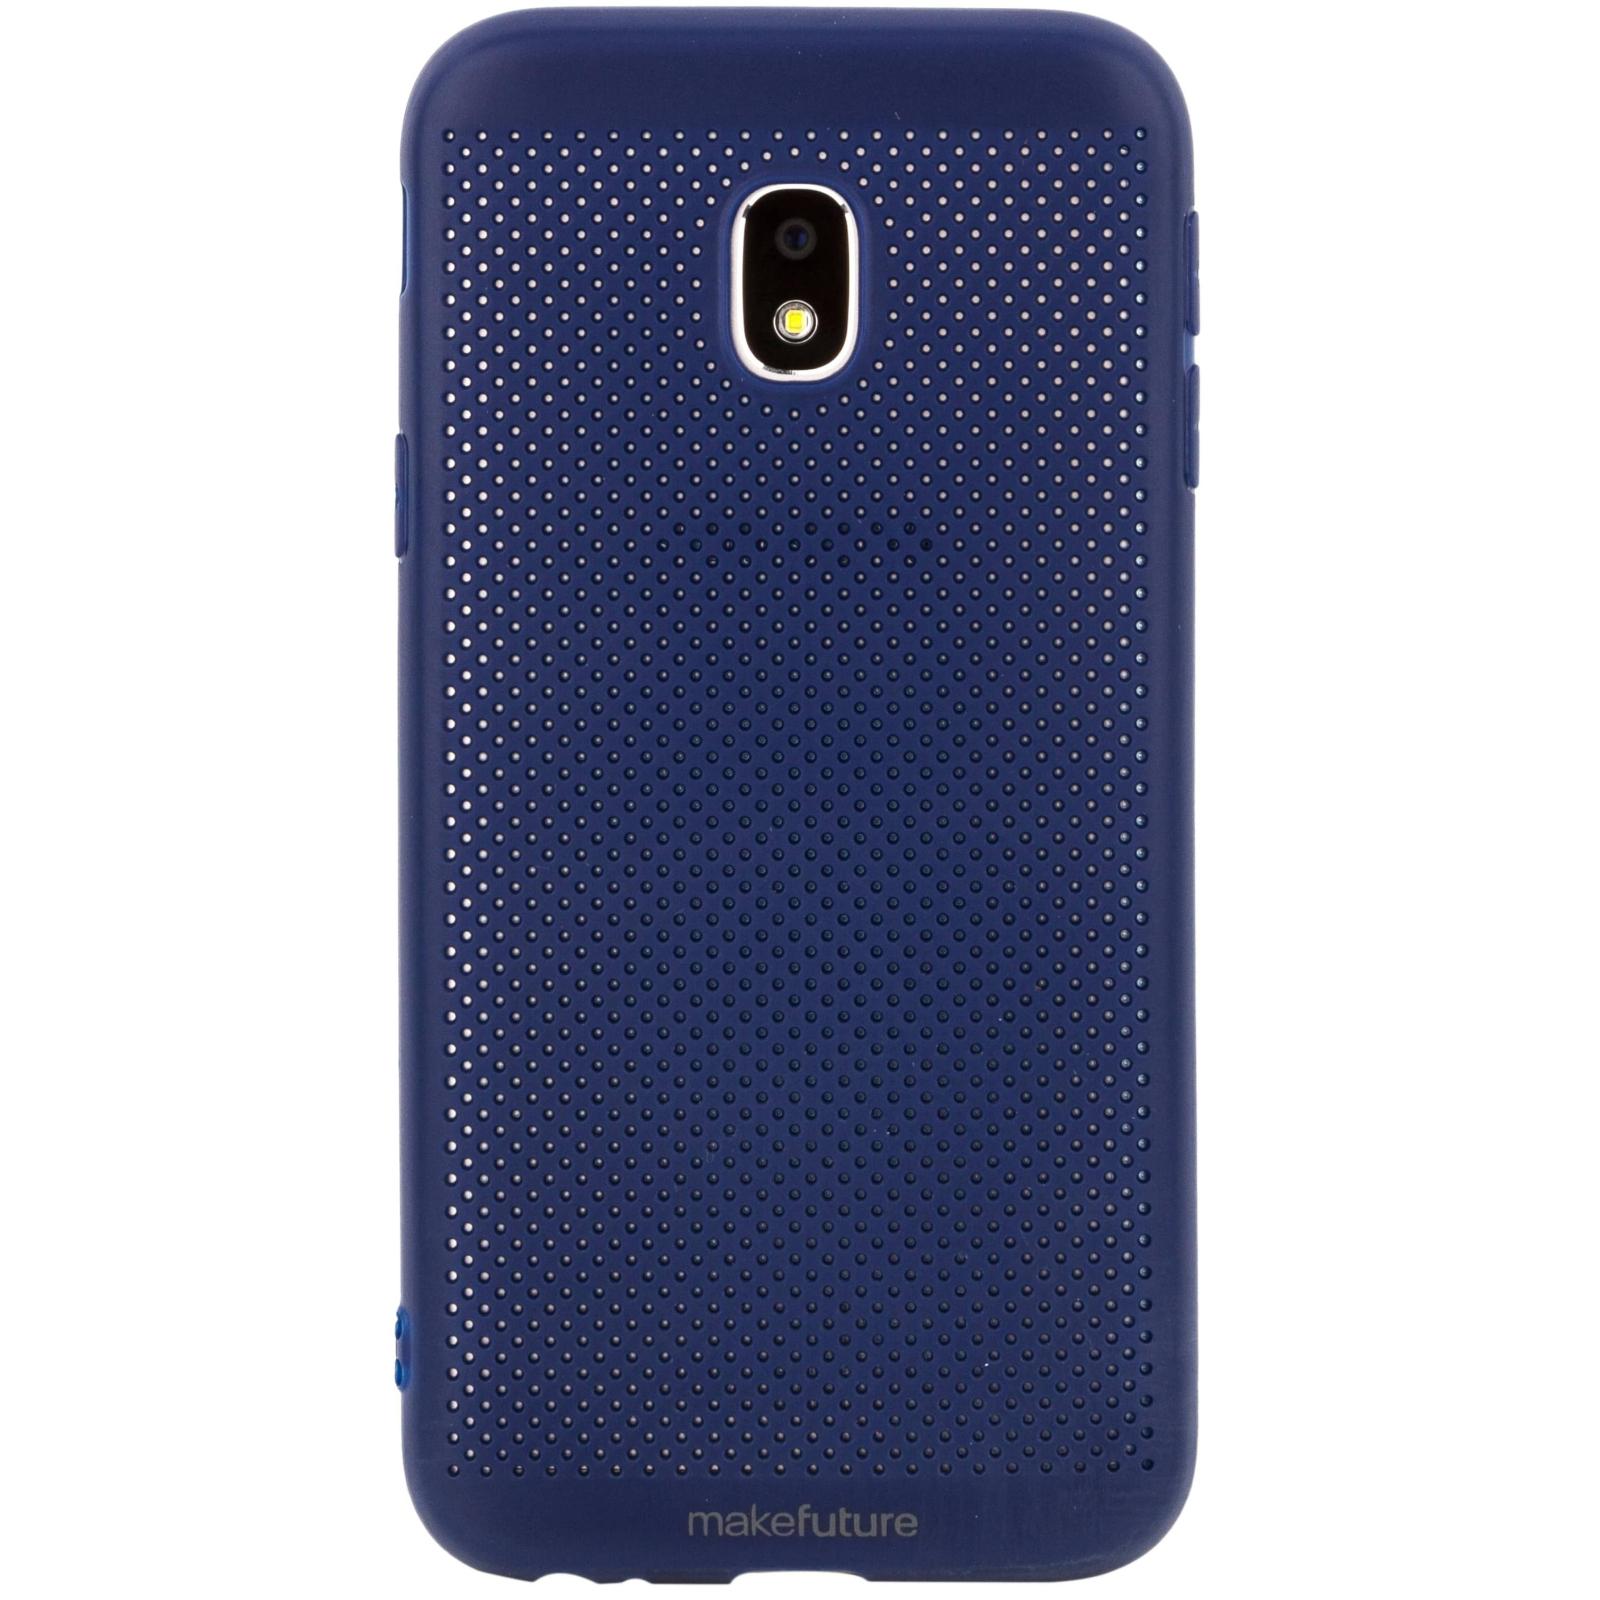 Чехол для моб. телефона MakeFuture Moon Case (TPU) для Samsung J3 2017 (J330) Blue (MCM-SJ330BL)